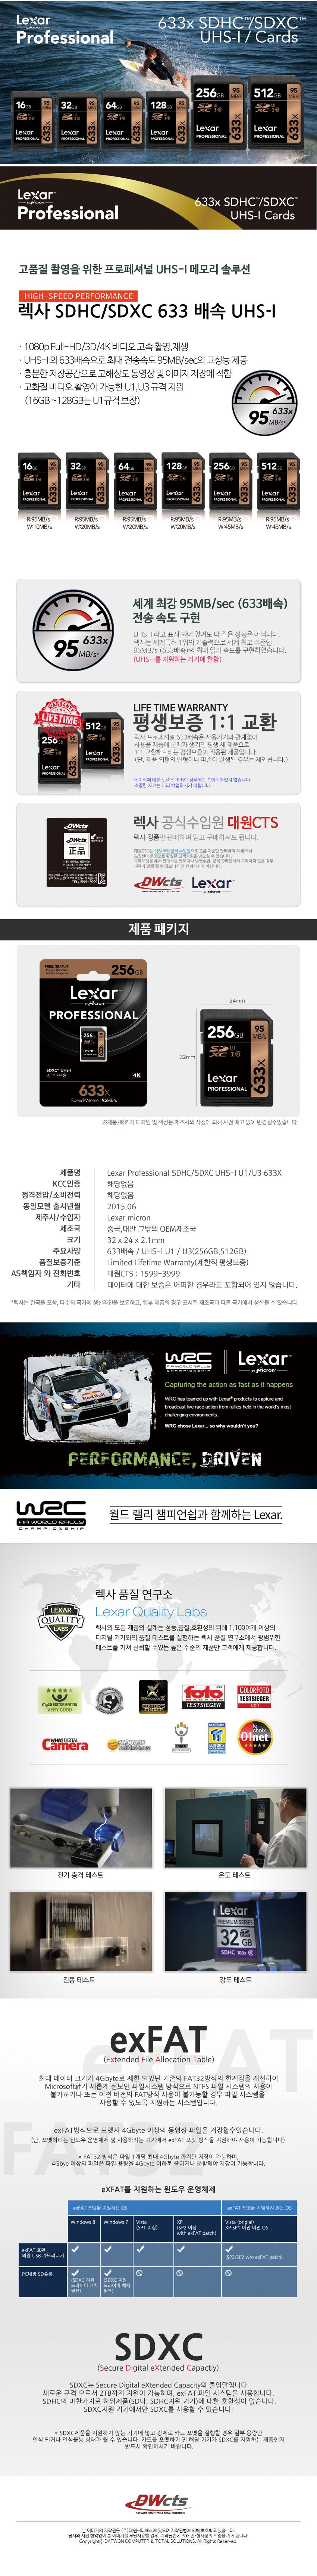 Lexar  SDHC CLASS10 UHS-I Professional 633X(32GB)